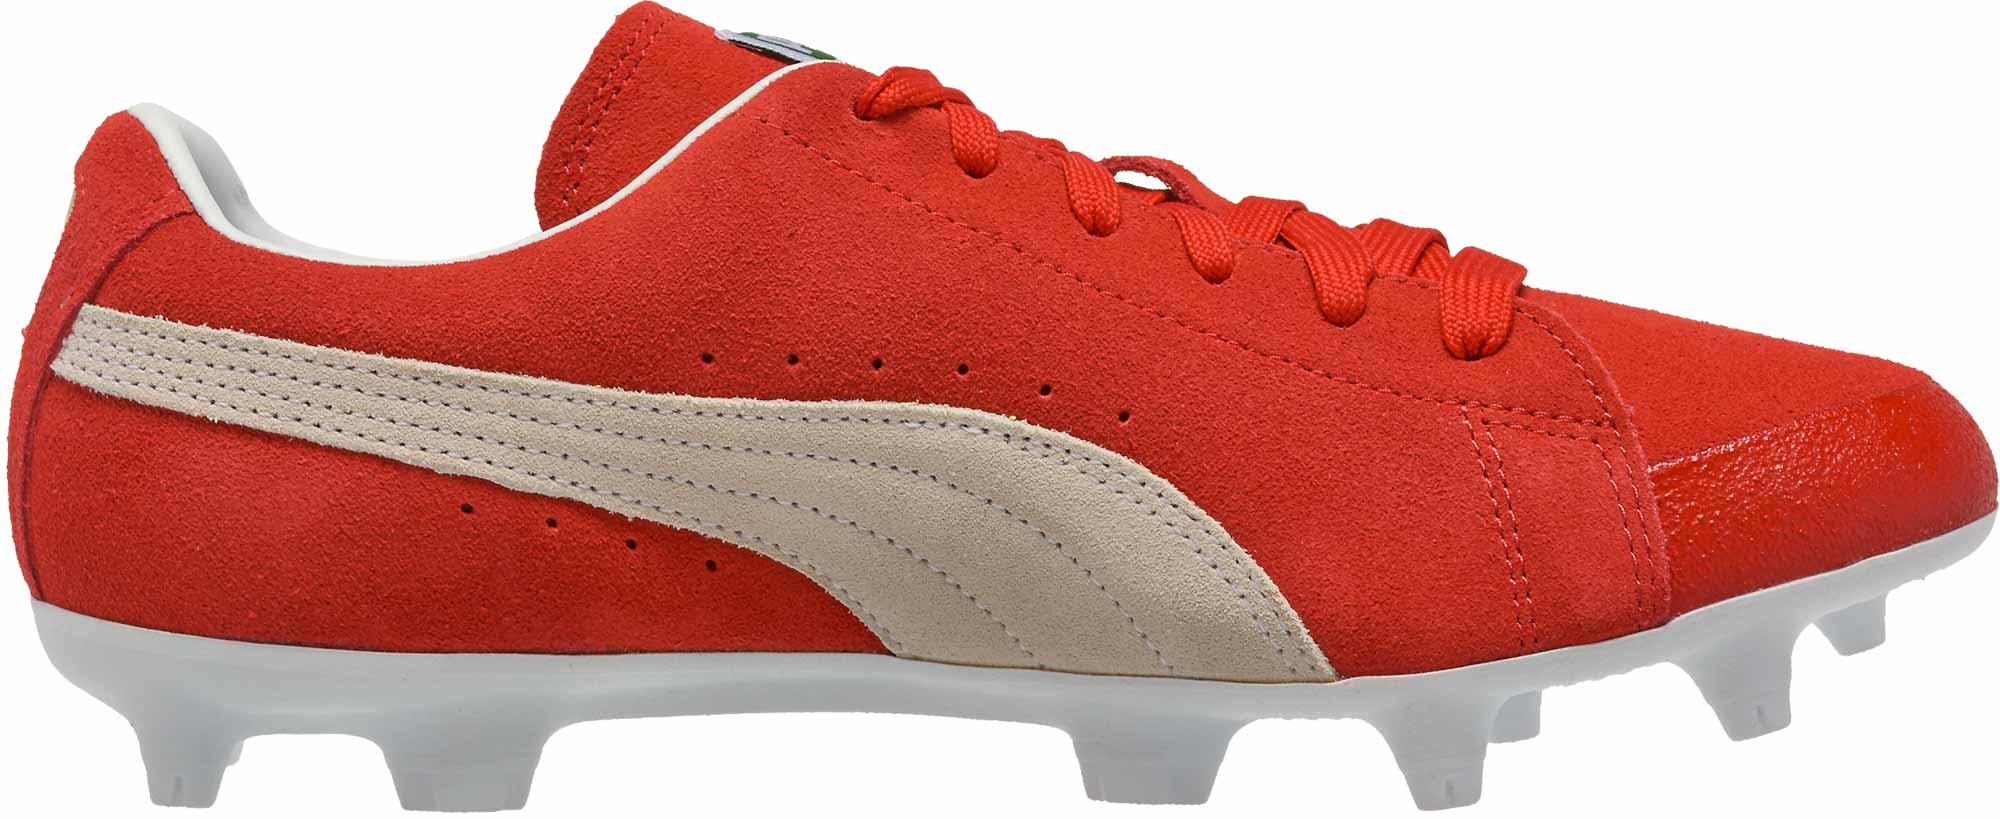 online store eba90 bd442 Puma Future Suede FG - 50th Anniversary - Red & White - Soccer Master